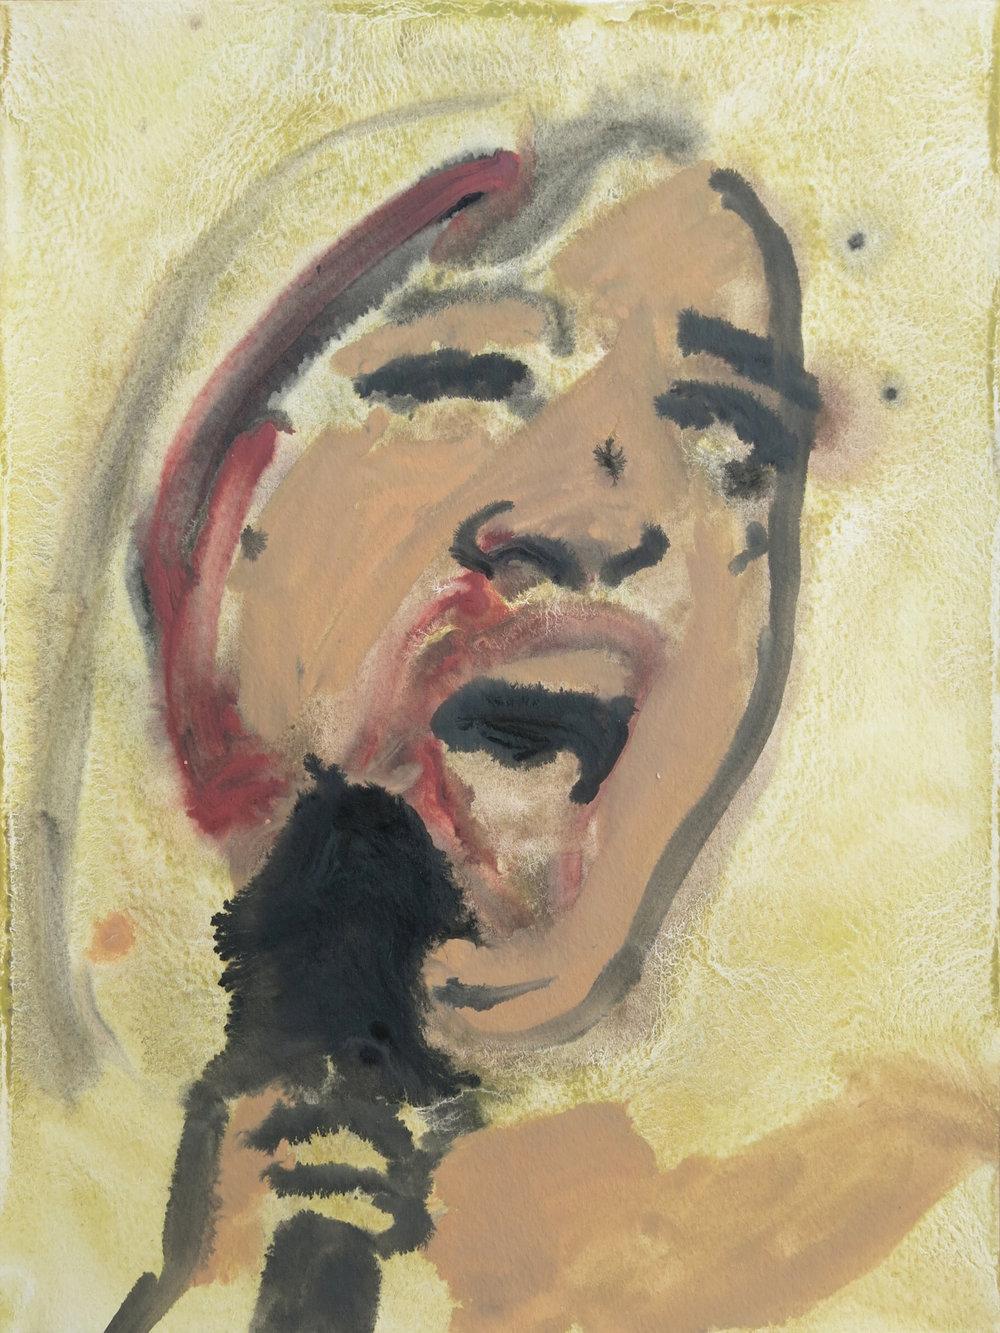 Barbra Streisand Portrait #200